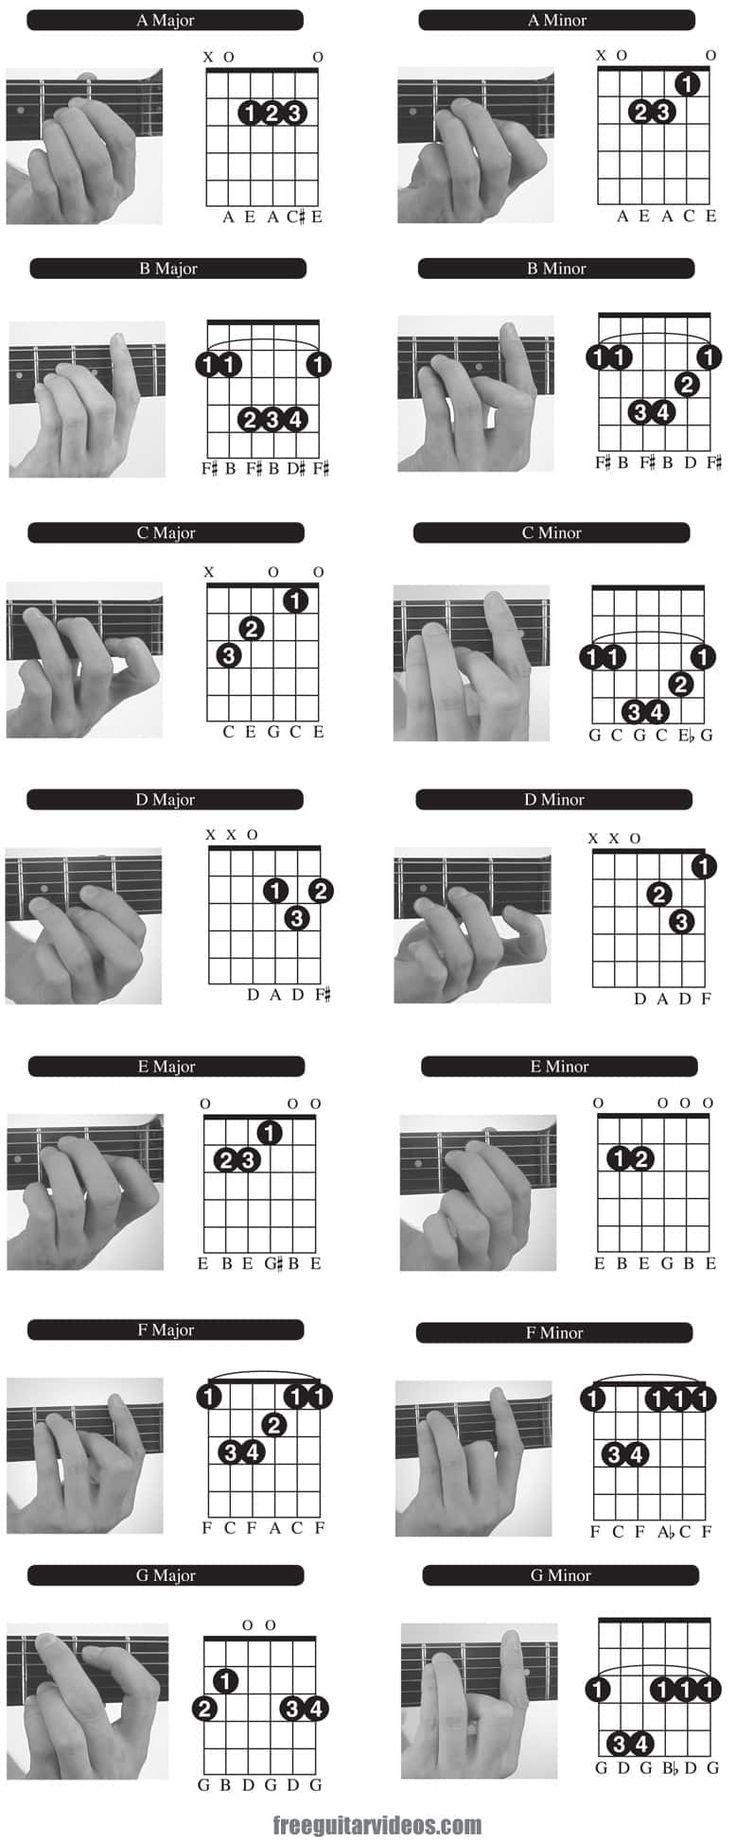 Guitar chord diagrams great visuals music education guitar chord diagrams great visuals hexwebz Images